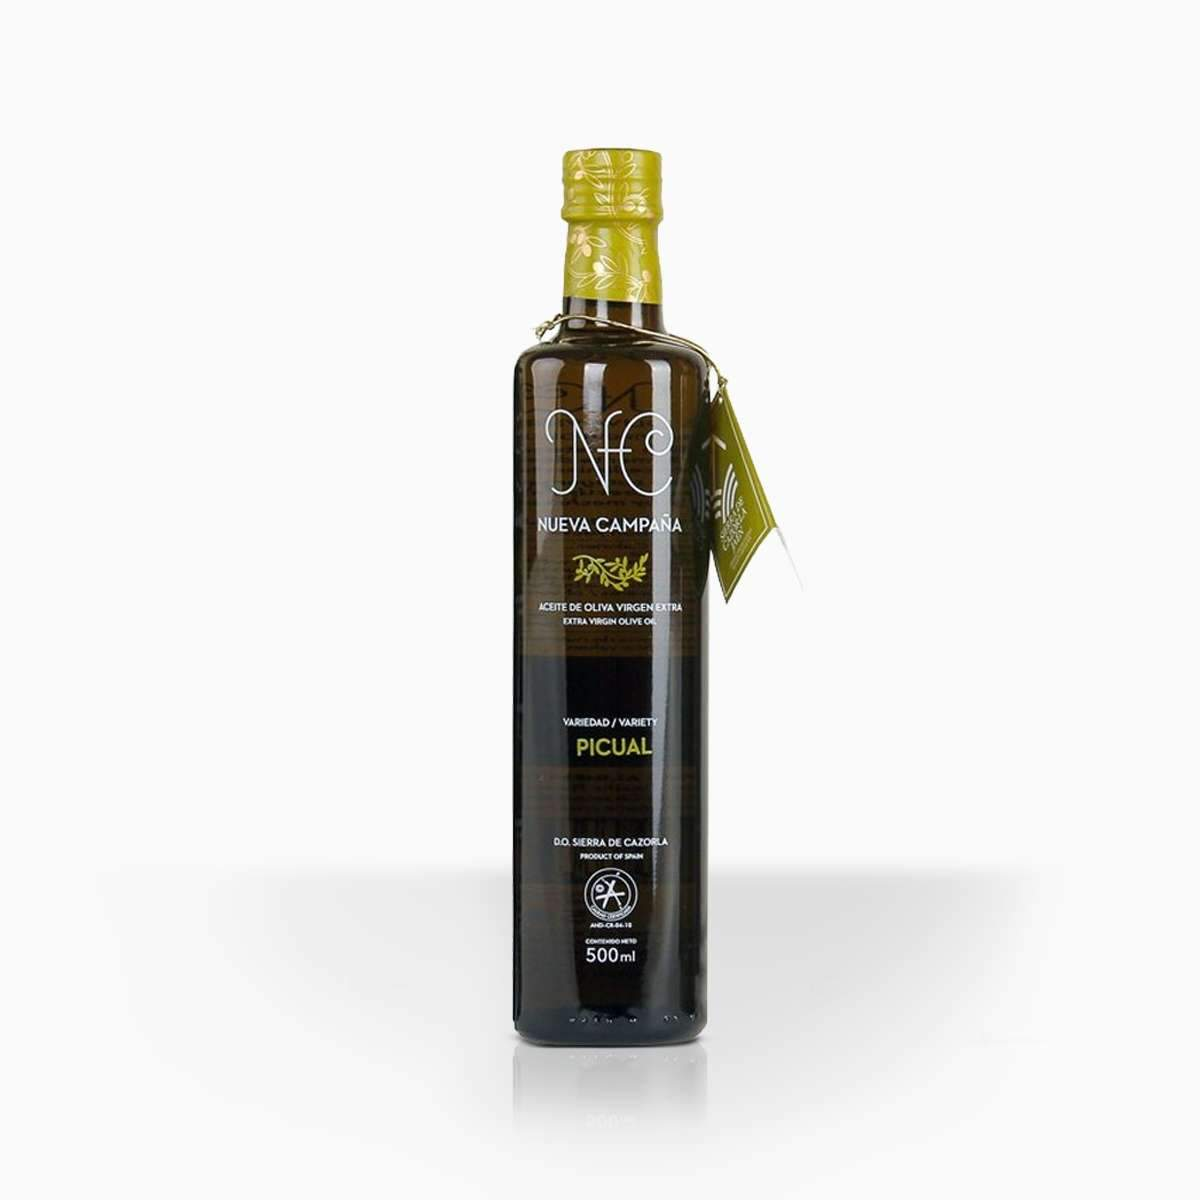 Nueva Campana Picual olivový olej Sierra de Cazorla 500ml